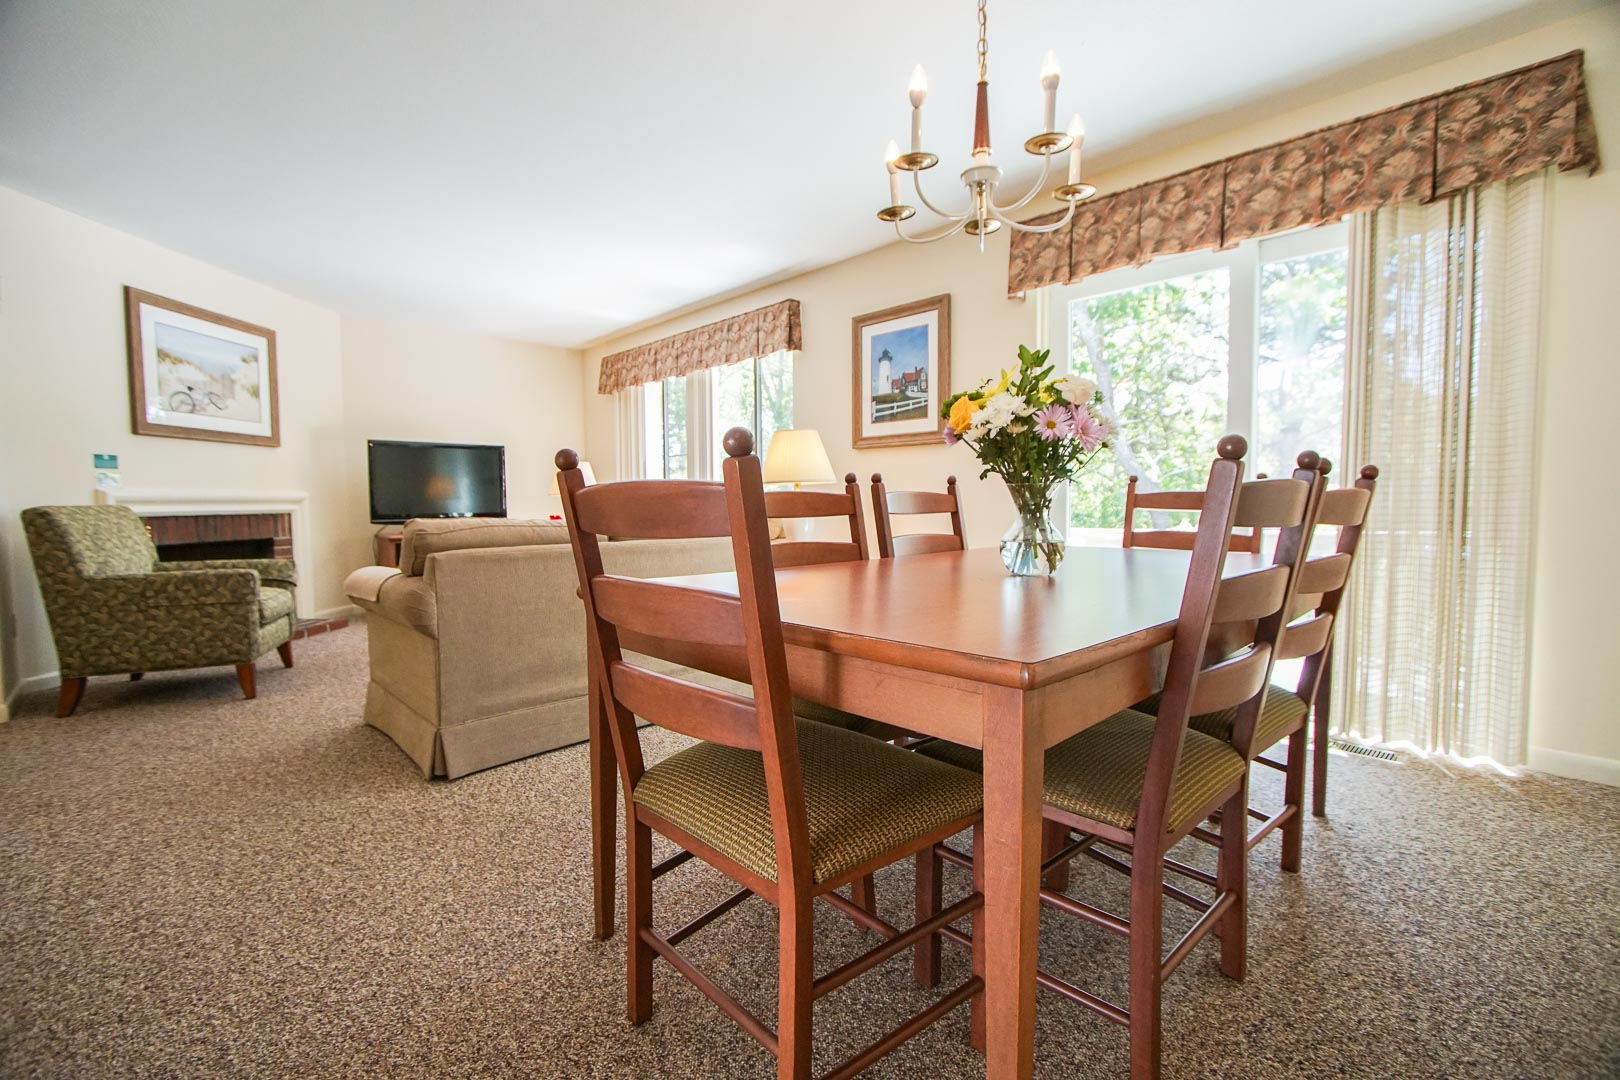 A quaint dining room area at VRI's Brewster Green Resort in Massachusetts.